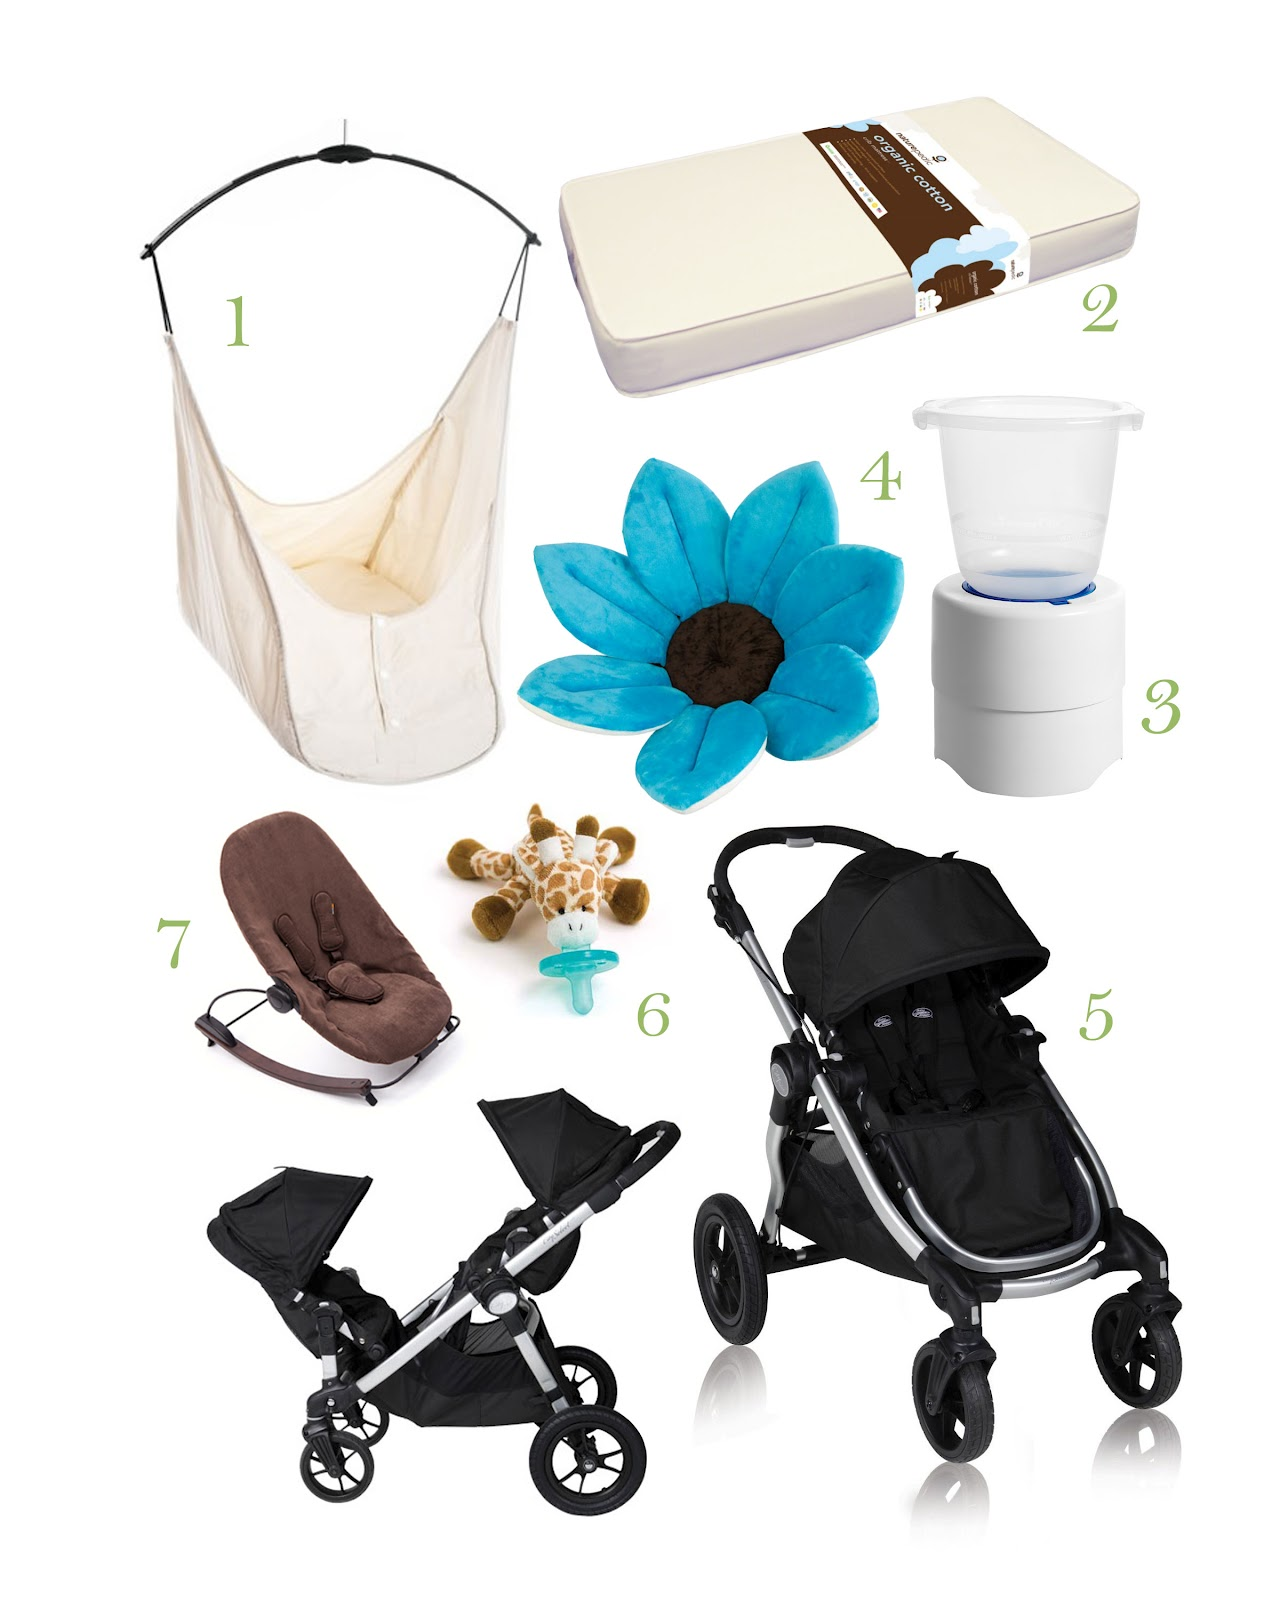 Baby Gear: Round 2 - Upgrading | Growing Up Senge